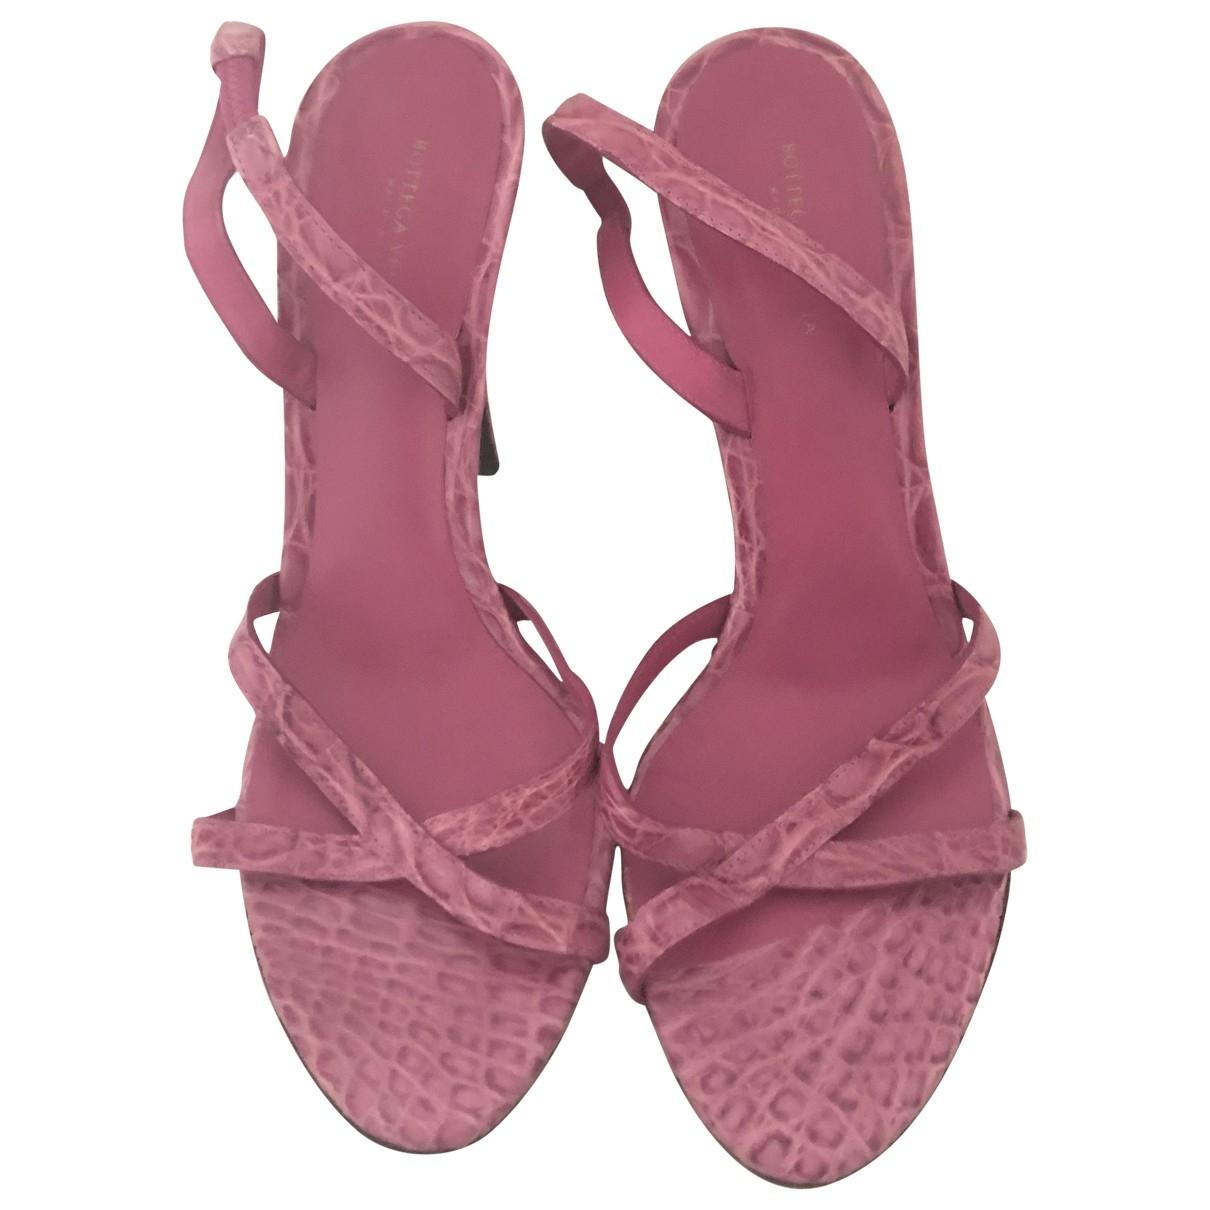 Bottega Veneta - Sandales   pour femme en crocodile - rose